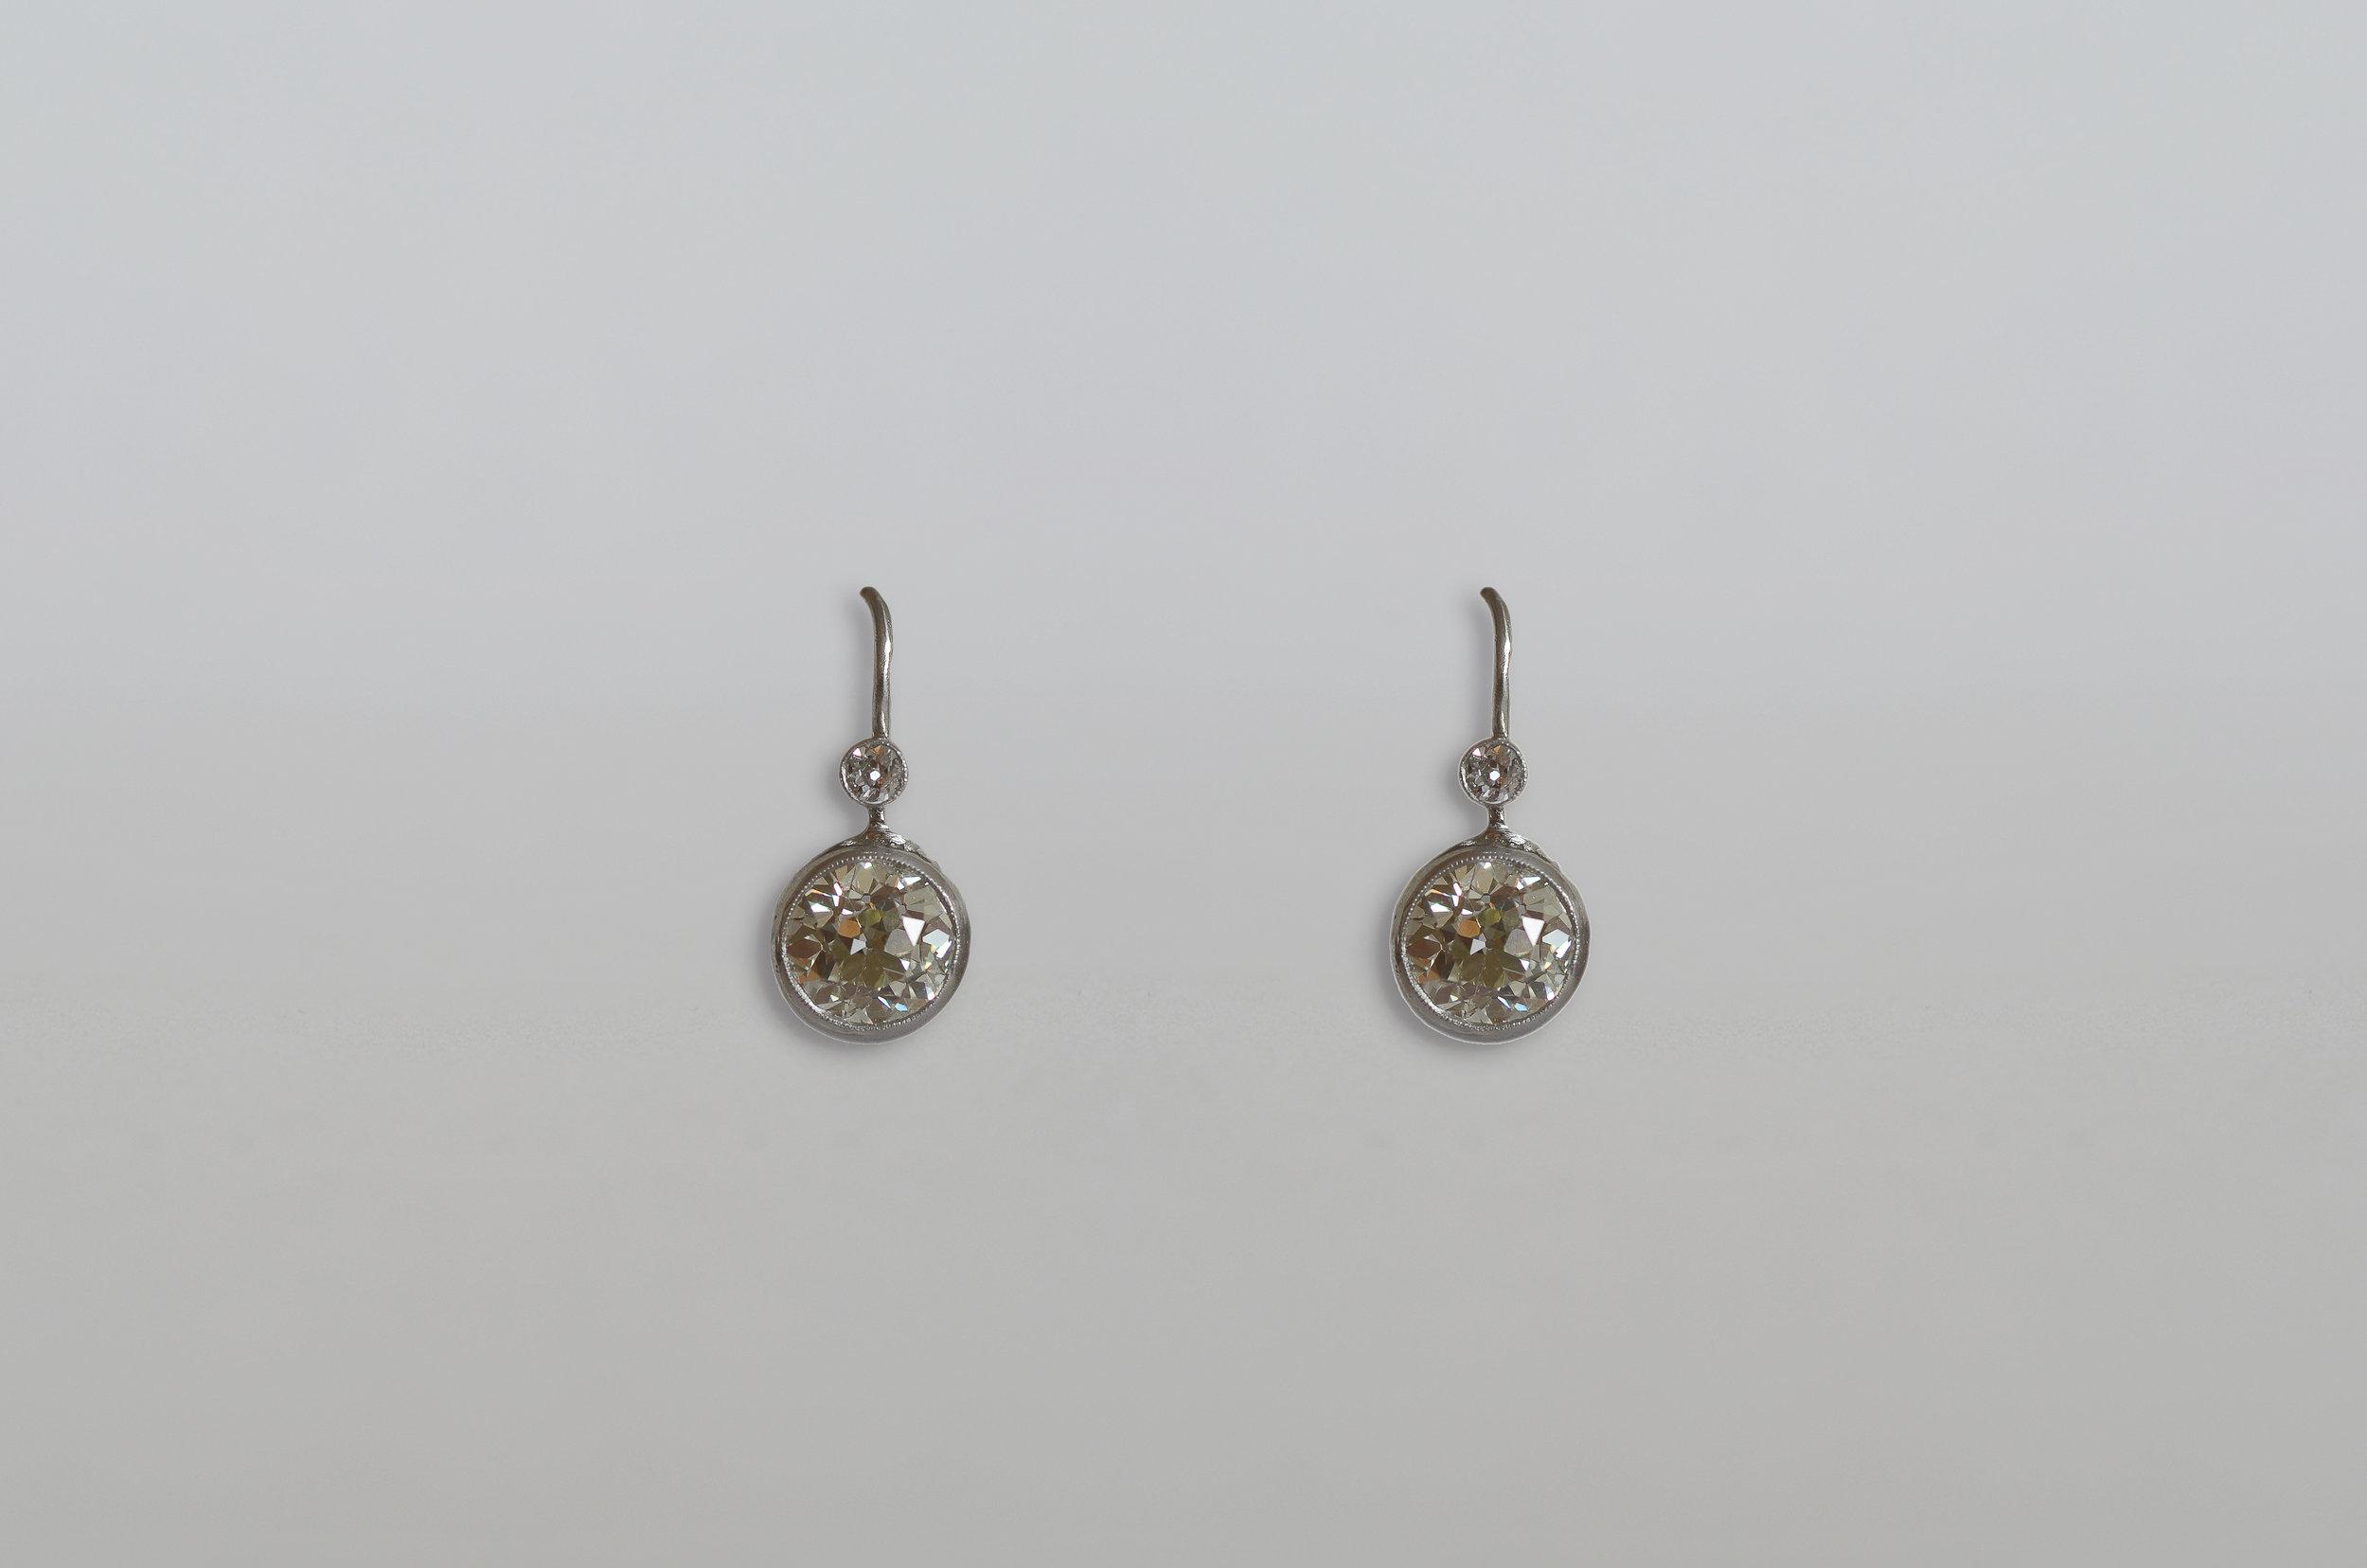 Antique 4.07 Carat Diamond Drop Earring with a total .10 Carat Diamond Top Stones